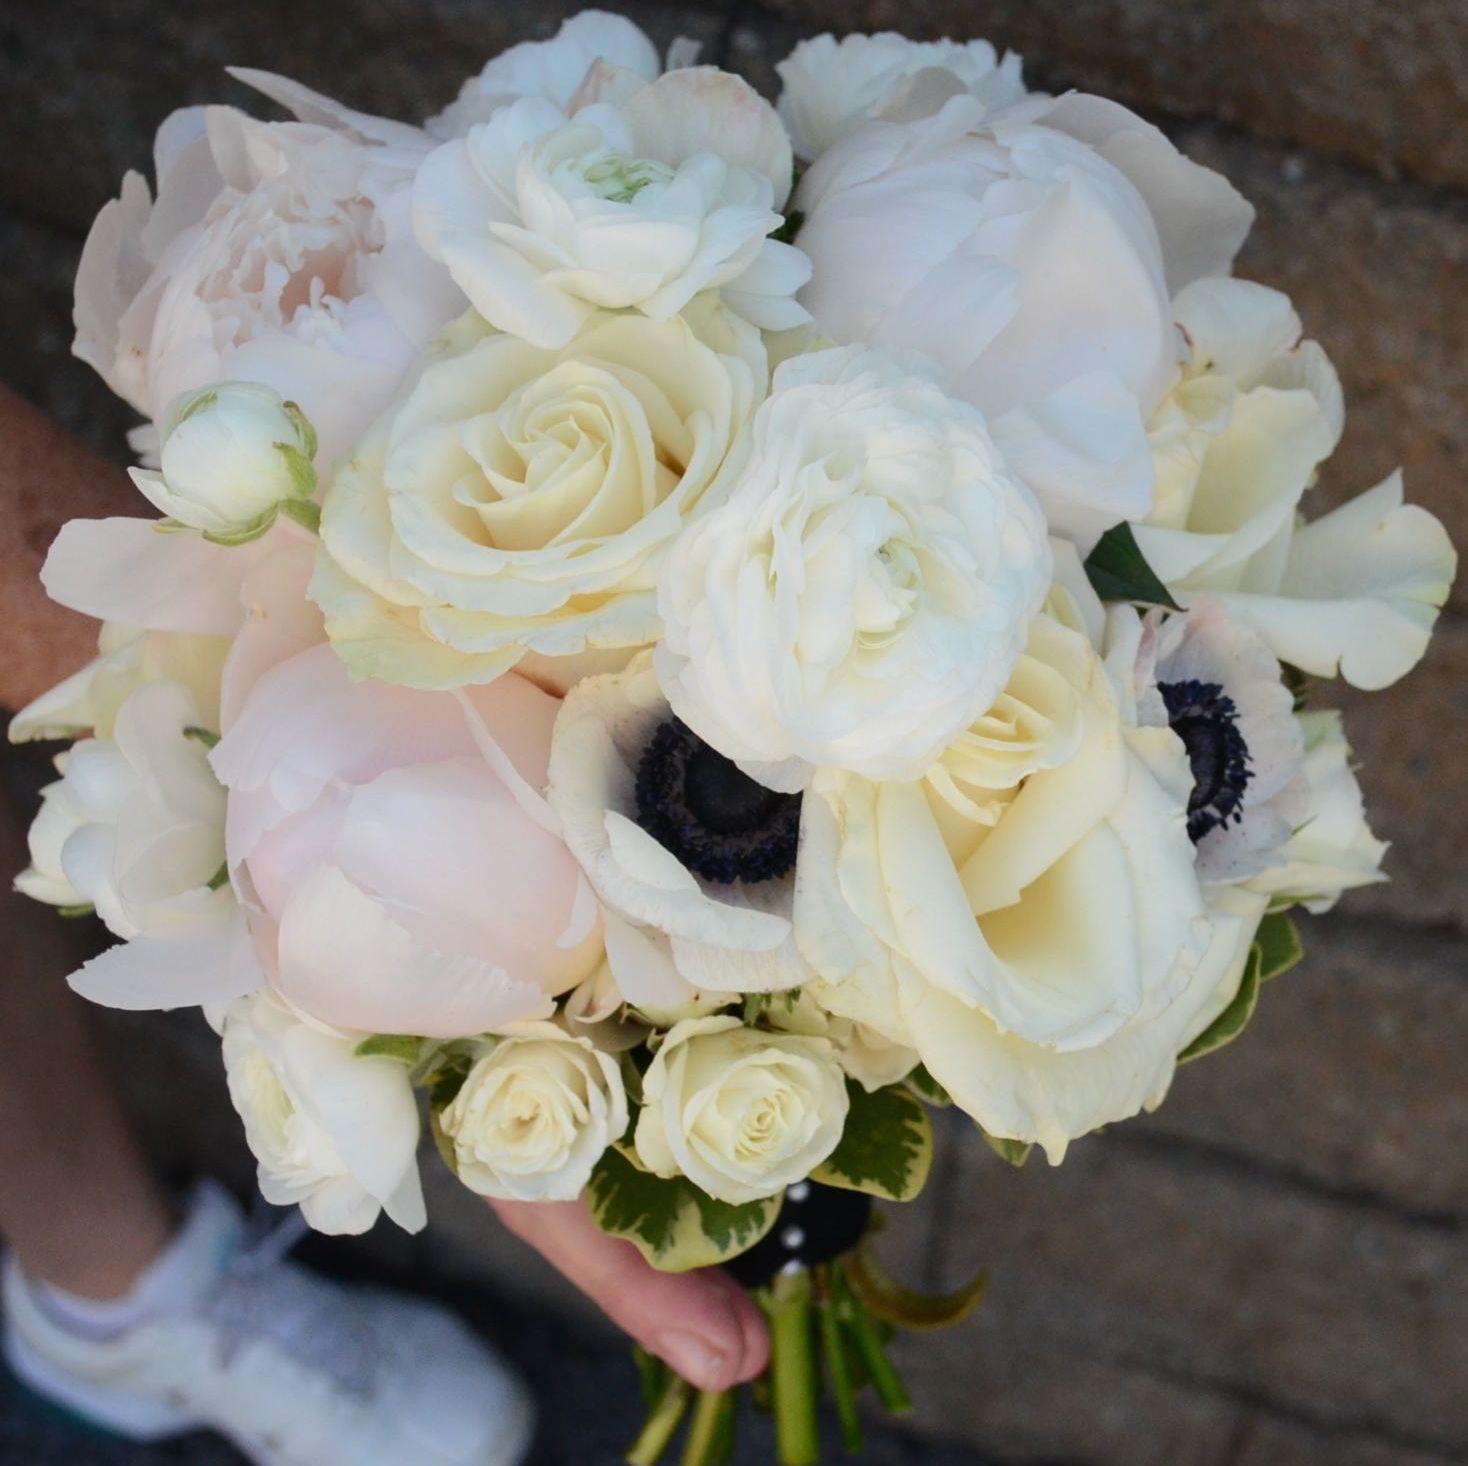 Cream Garden Rose bridal bouquet. double blush/white peonies, white ranunculus